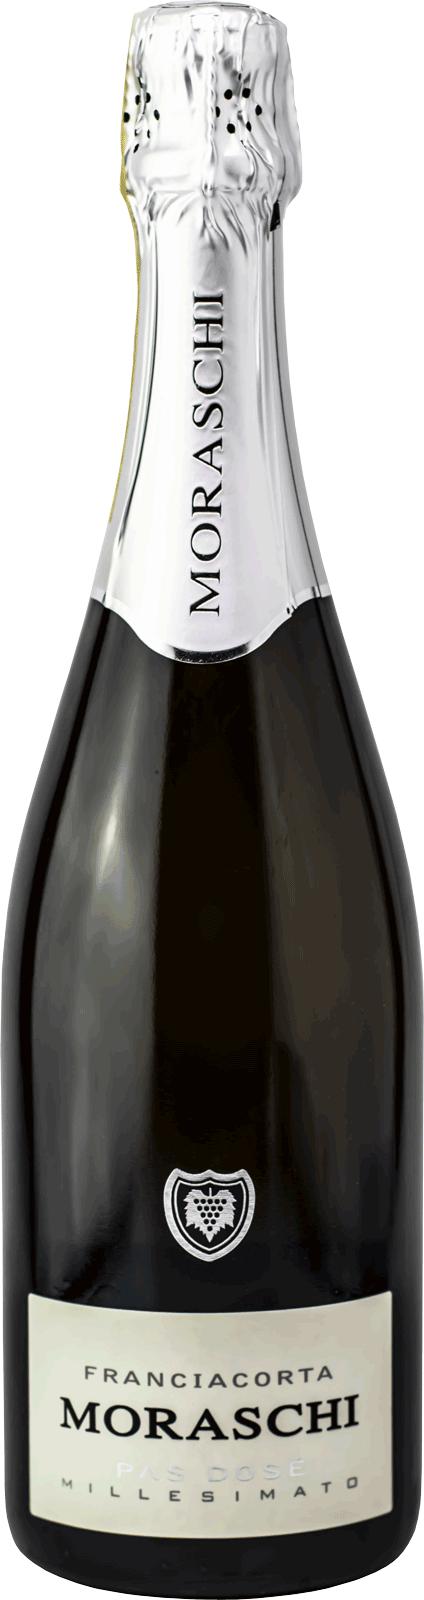 moraschi franciacorta vini pas dose spumante